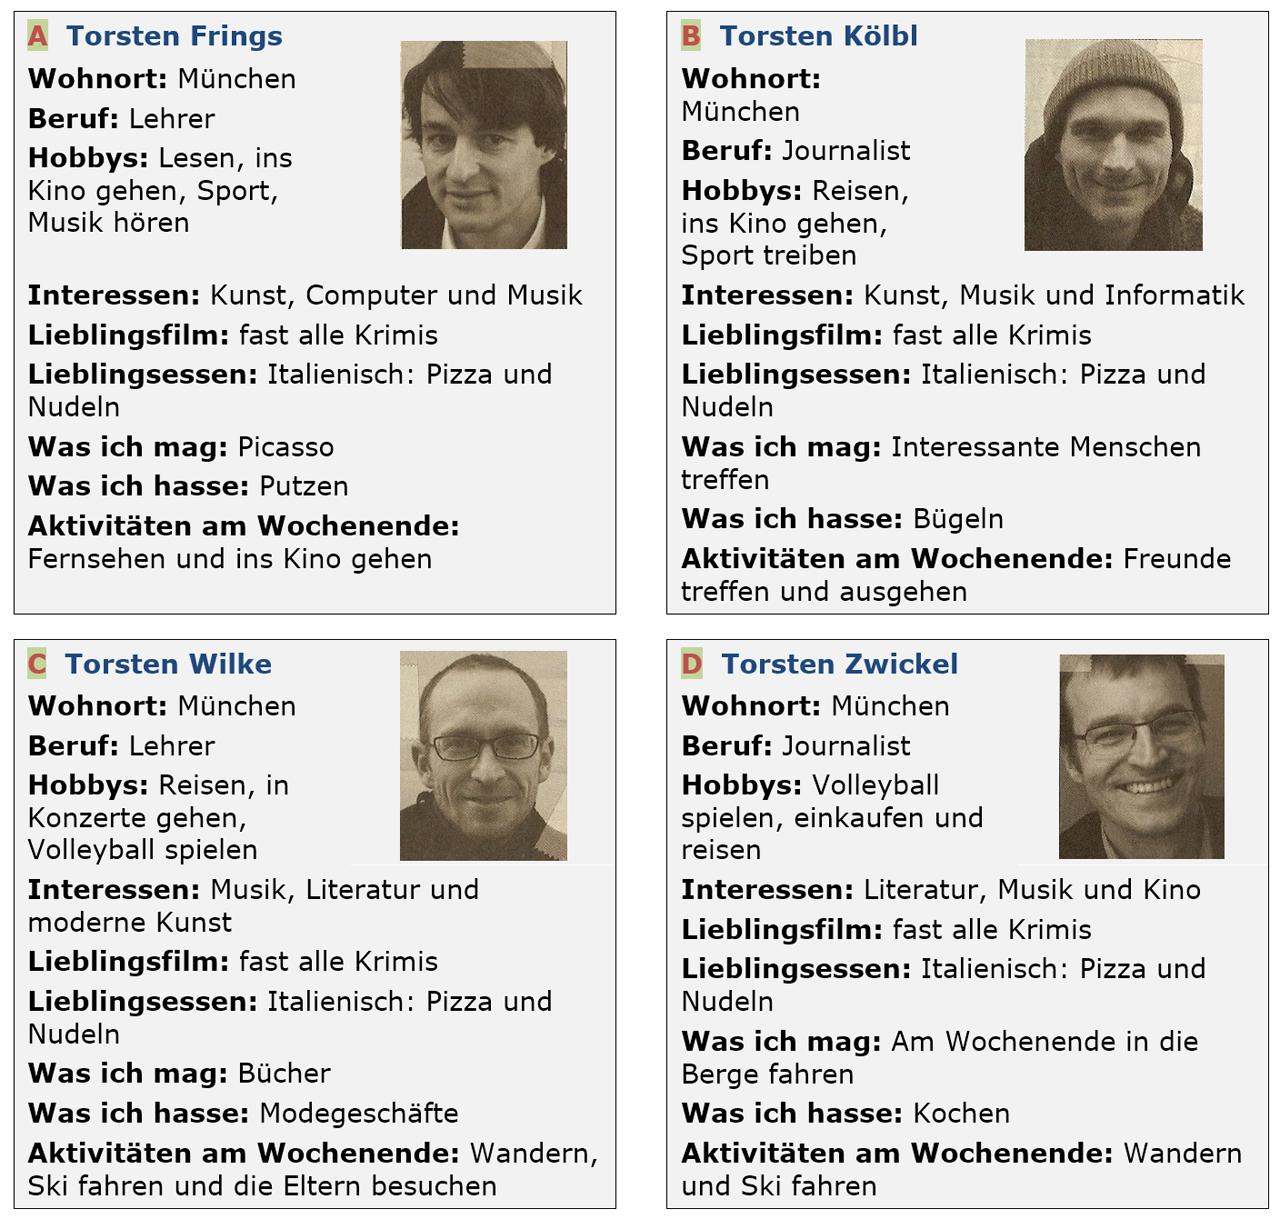 Hörverstehen_Idealpaar_A1_4_Steckbriefe_Torsten_deutschernerblog